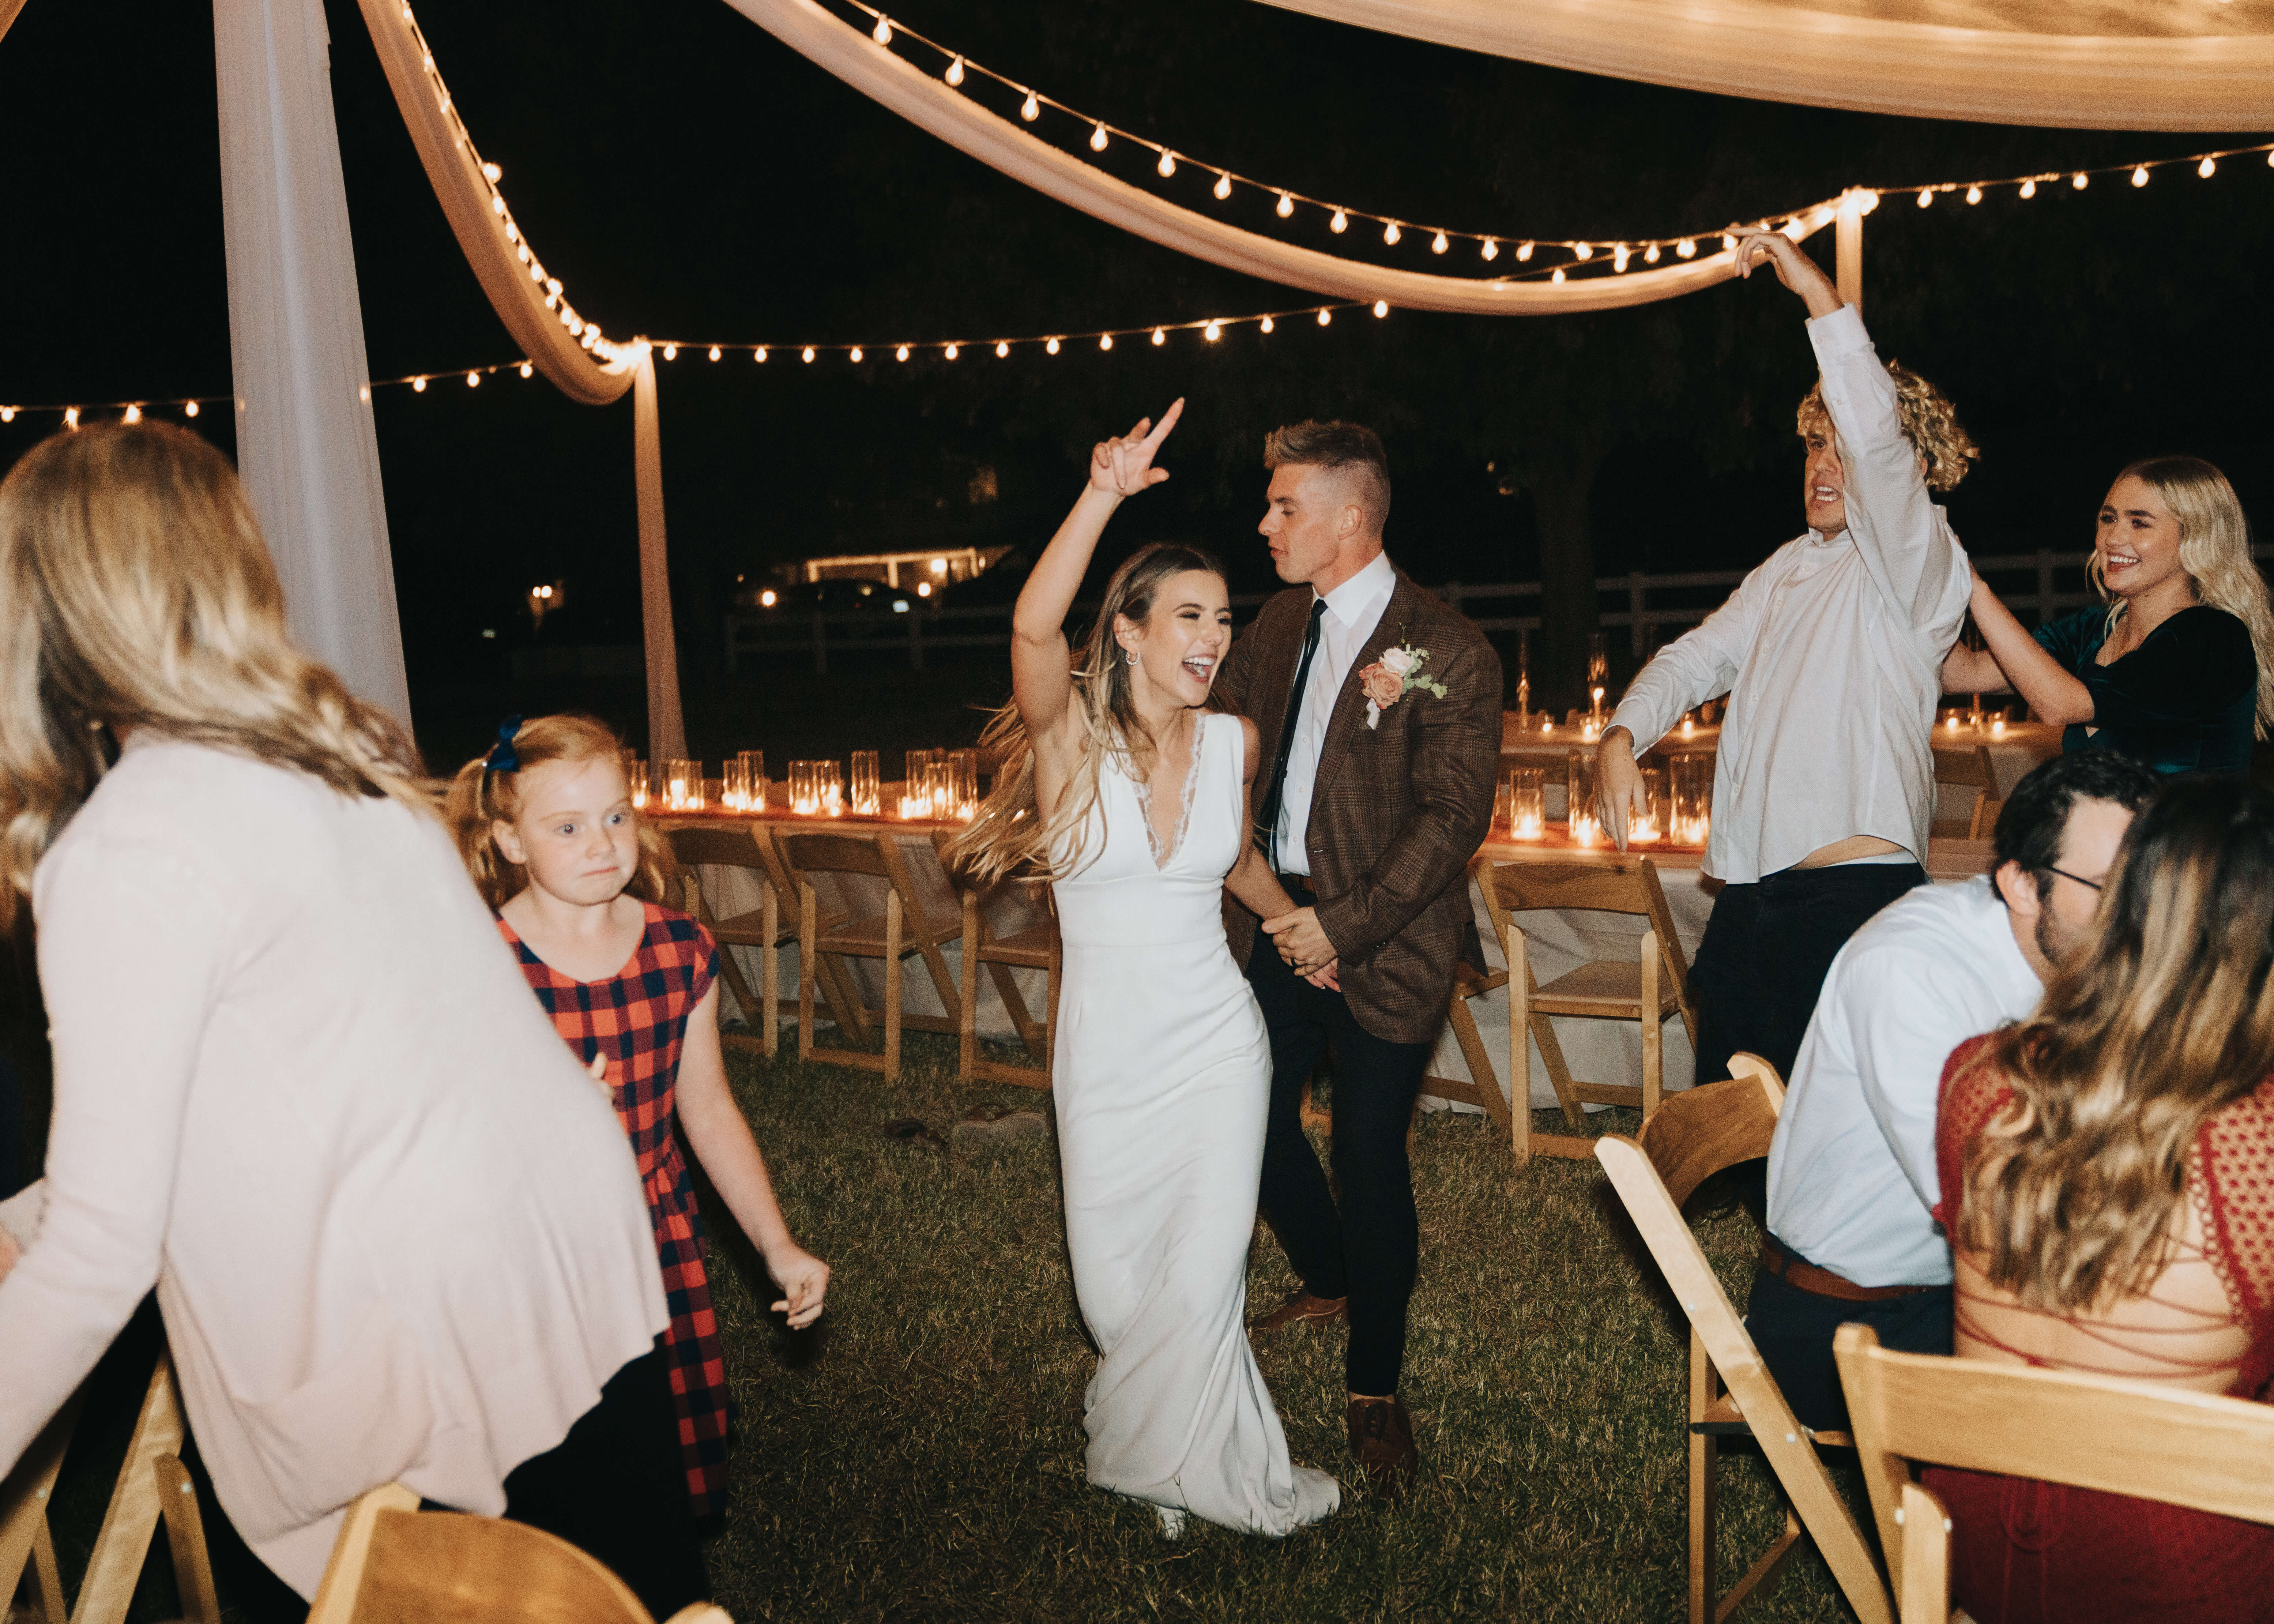 wedding party crazy dancing photo